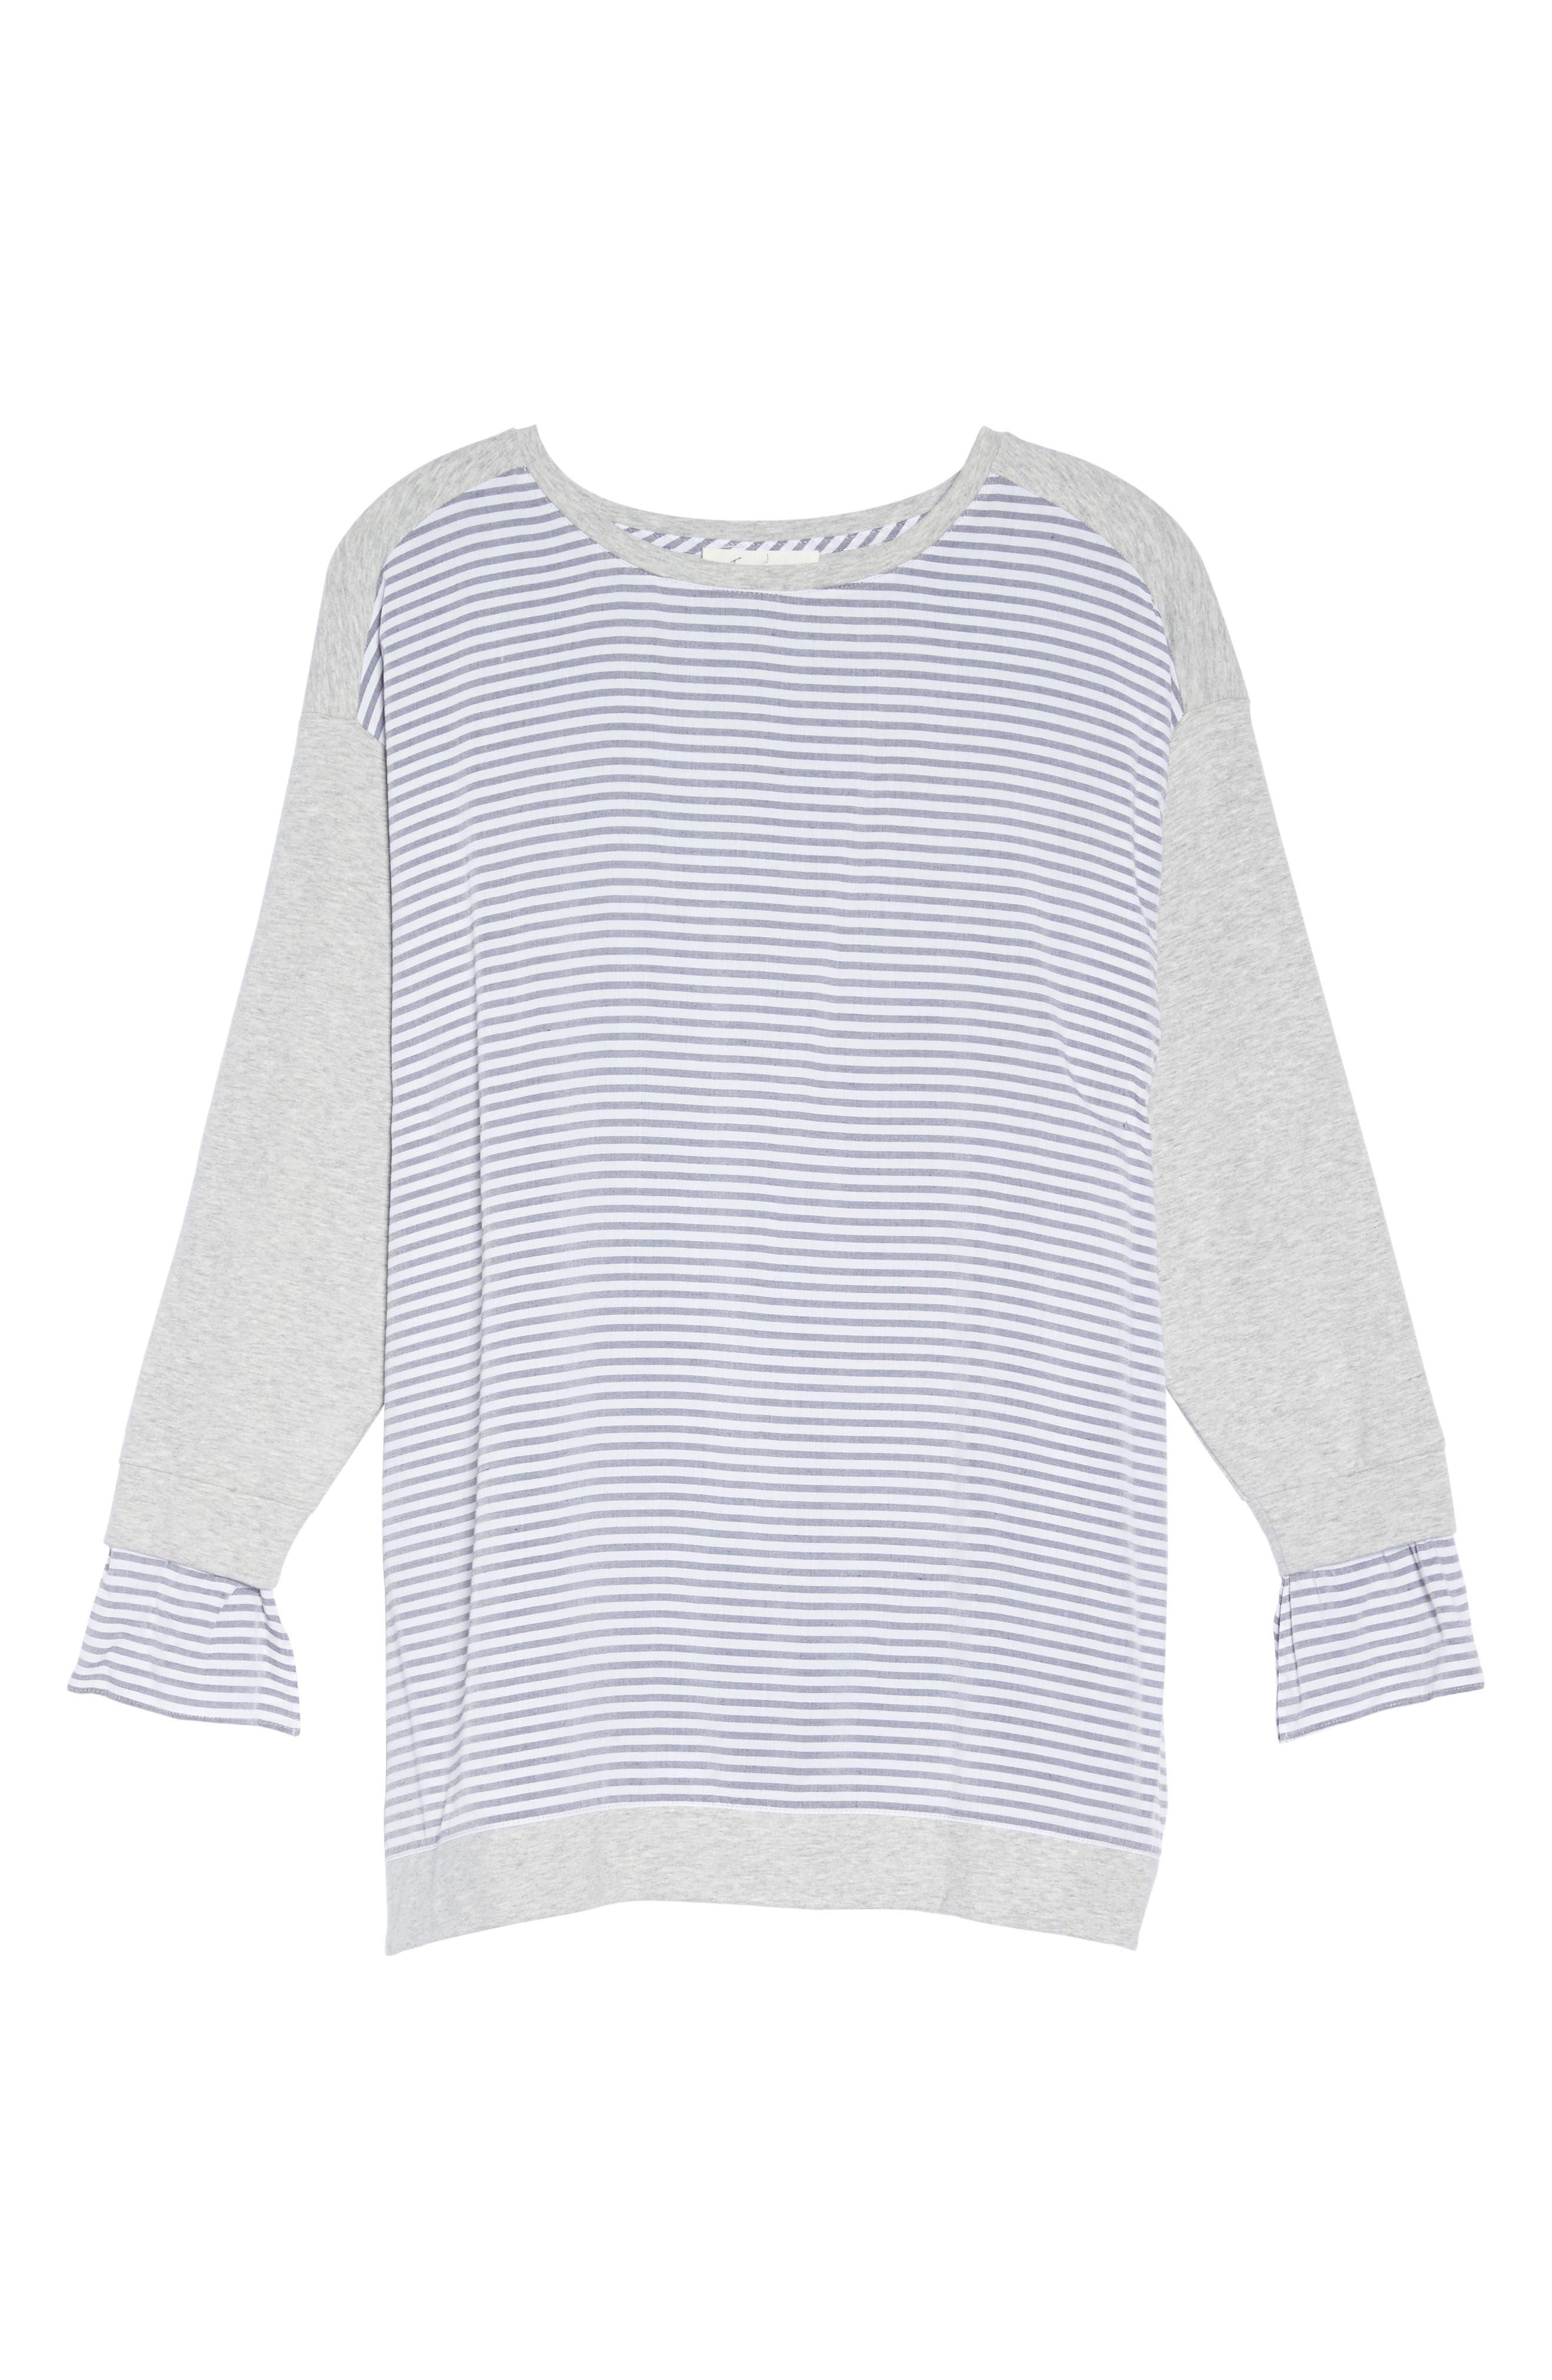 Mixed Media Sweatshirt,                             Alternate thumbnail 6, color,                             Grey Heather